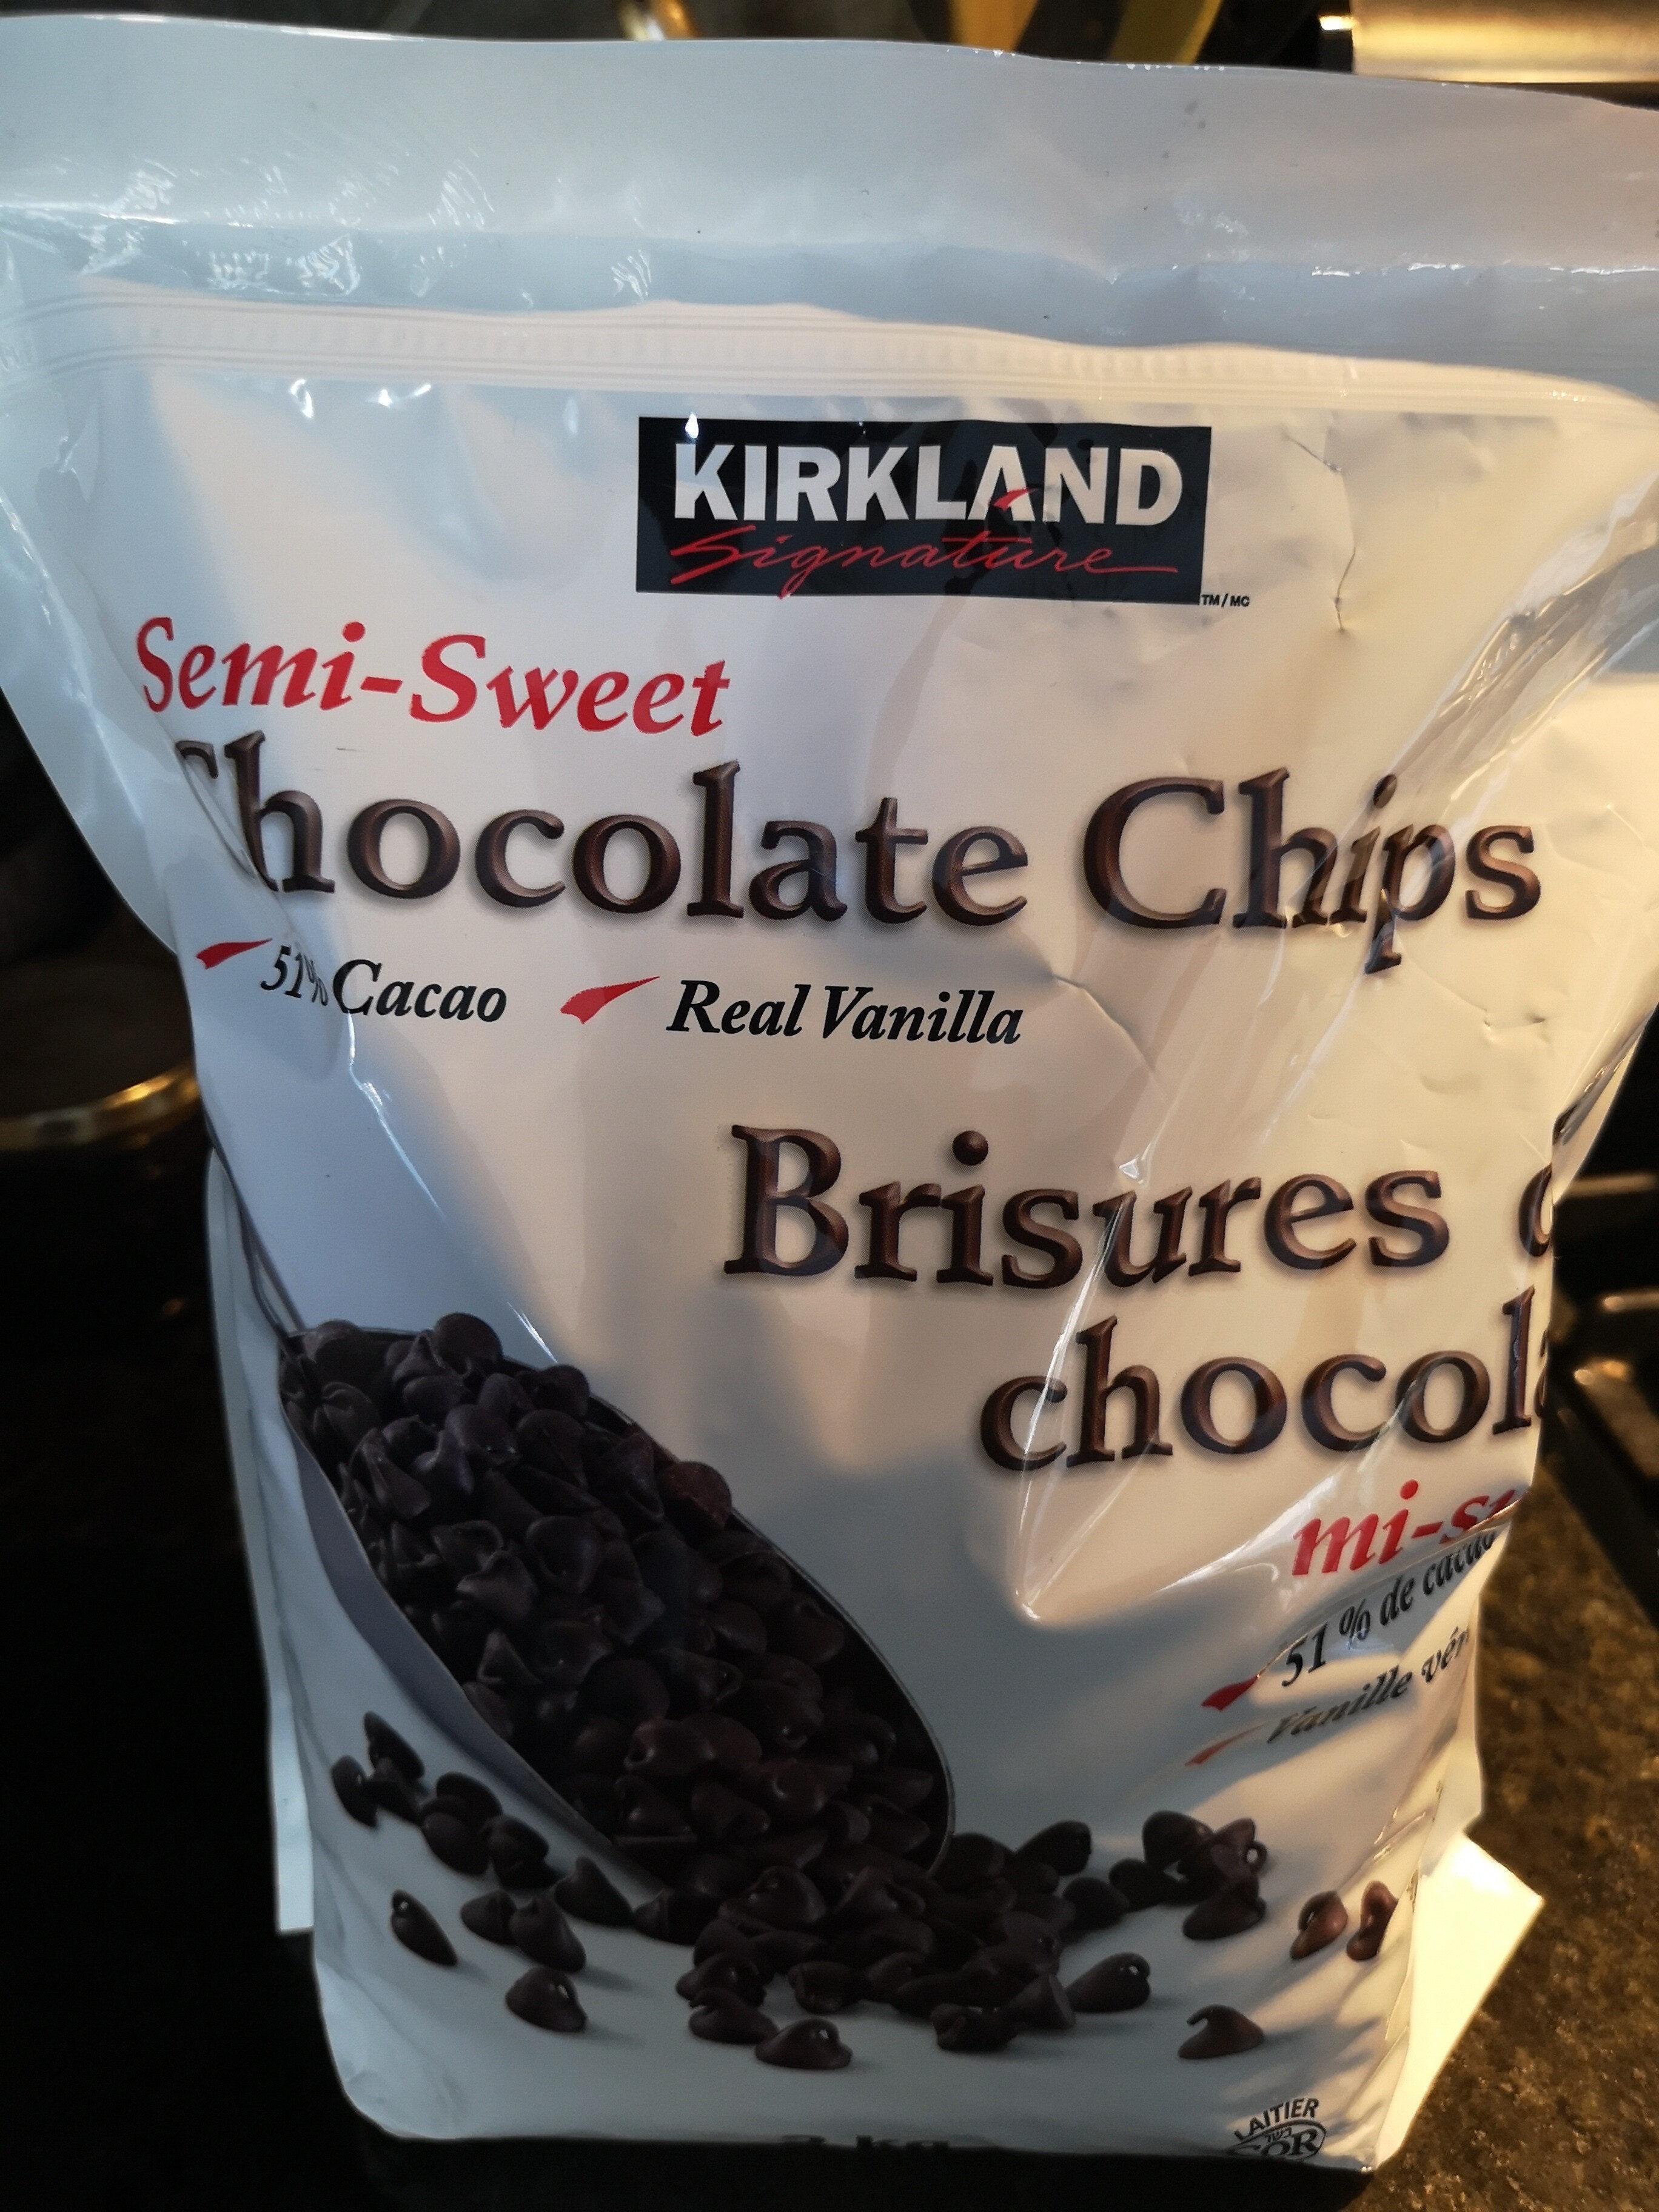 Brisures de Chocolat - Product - en